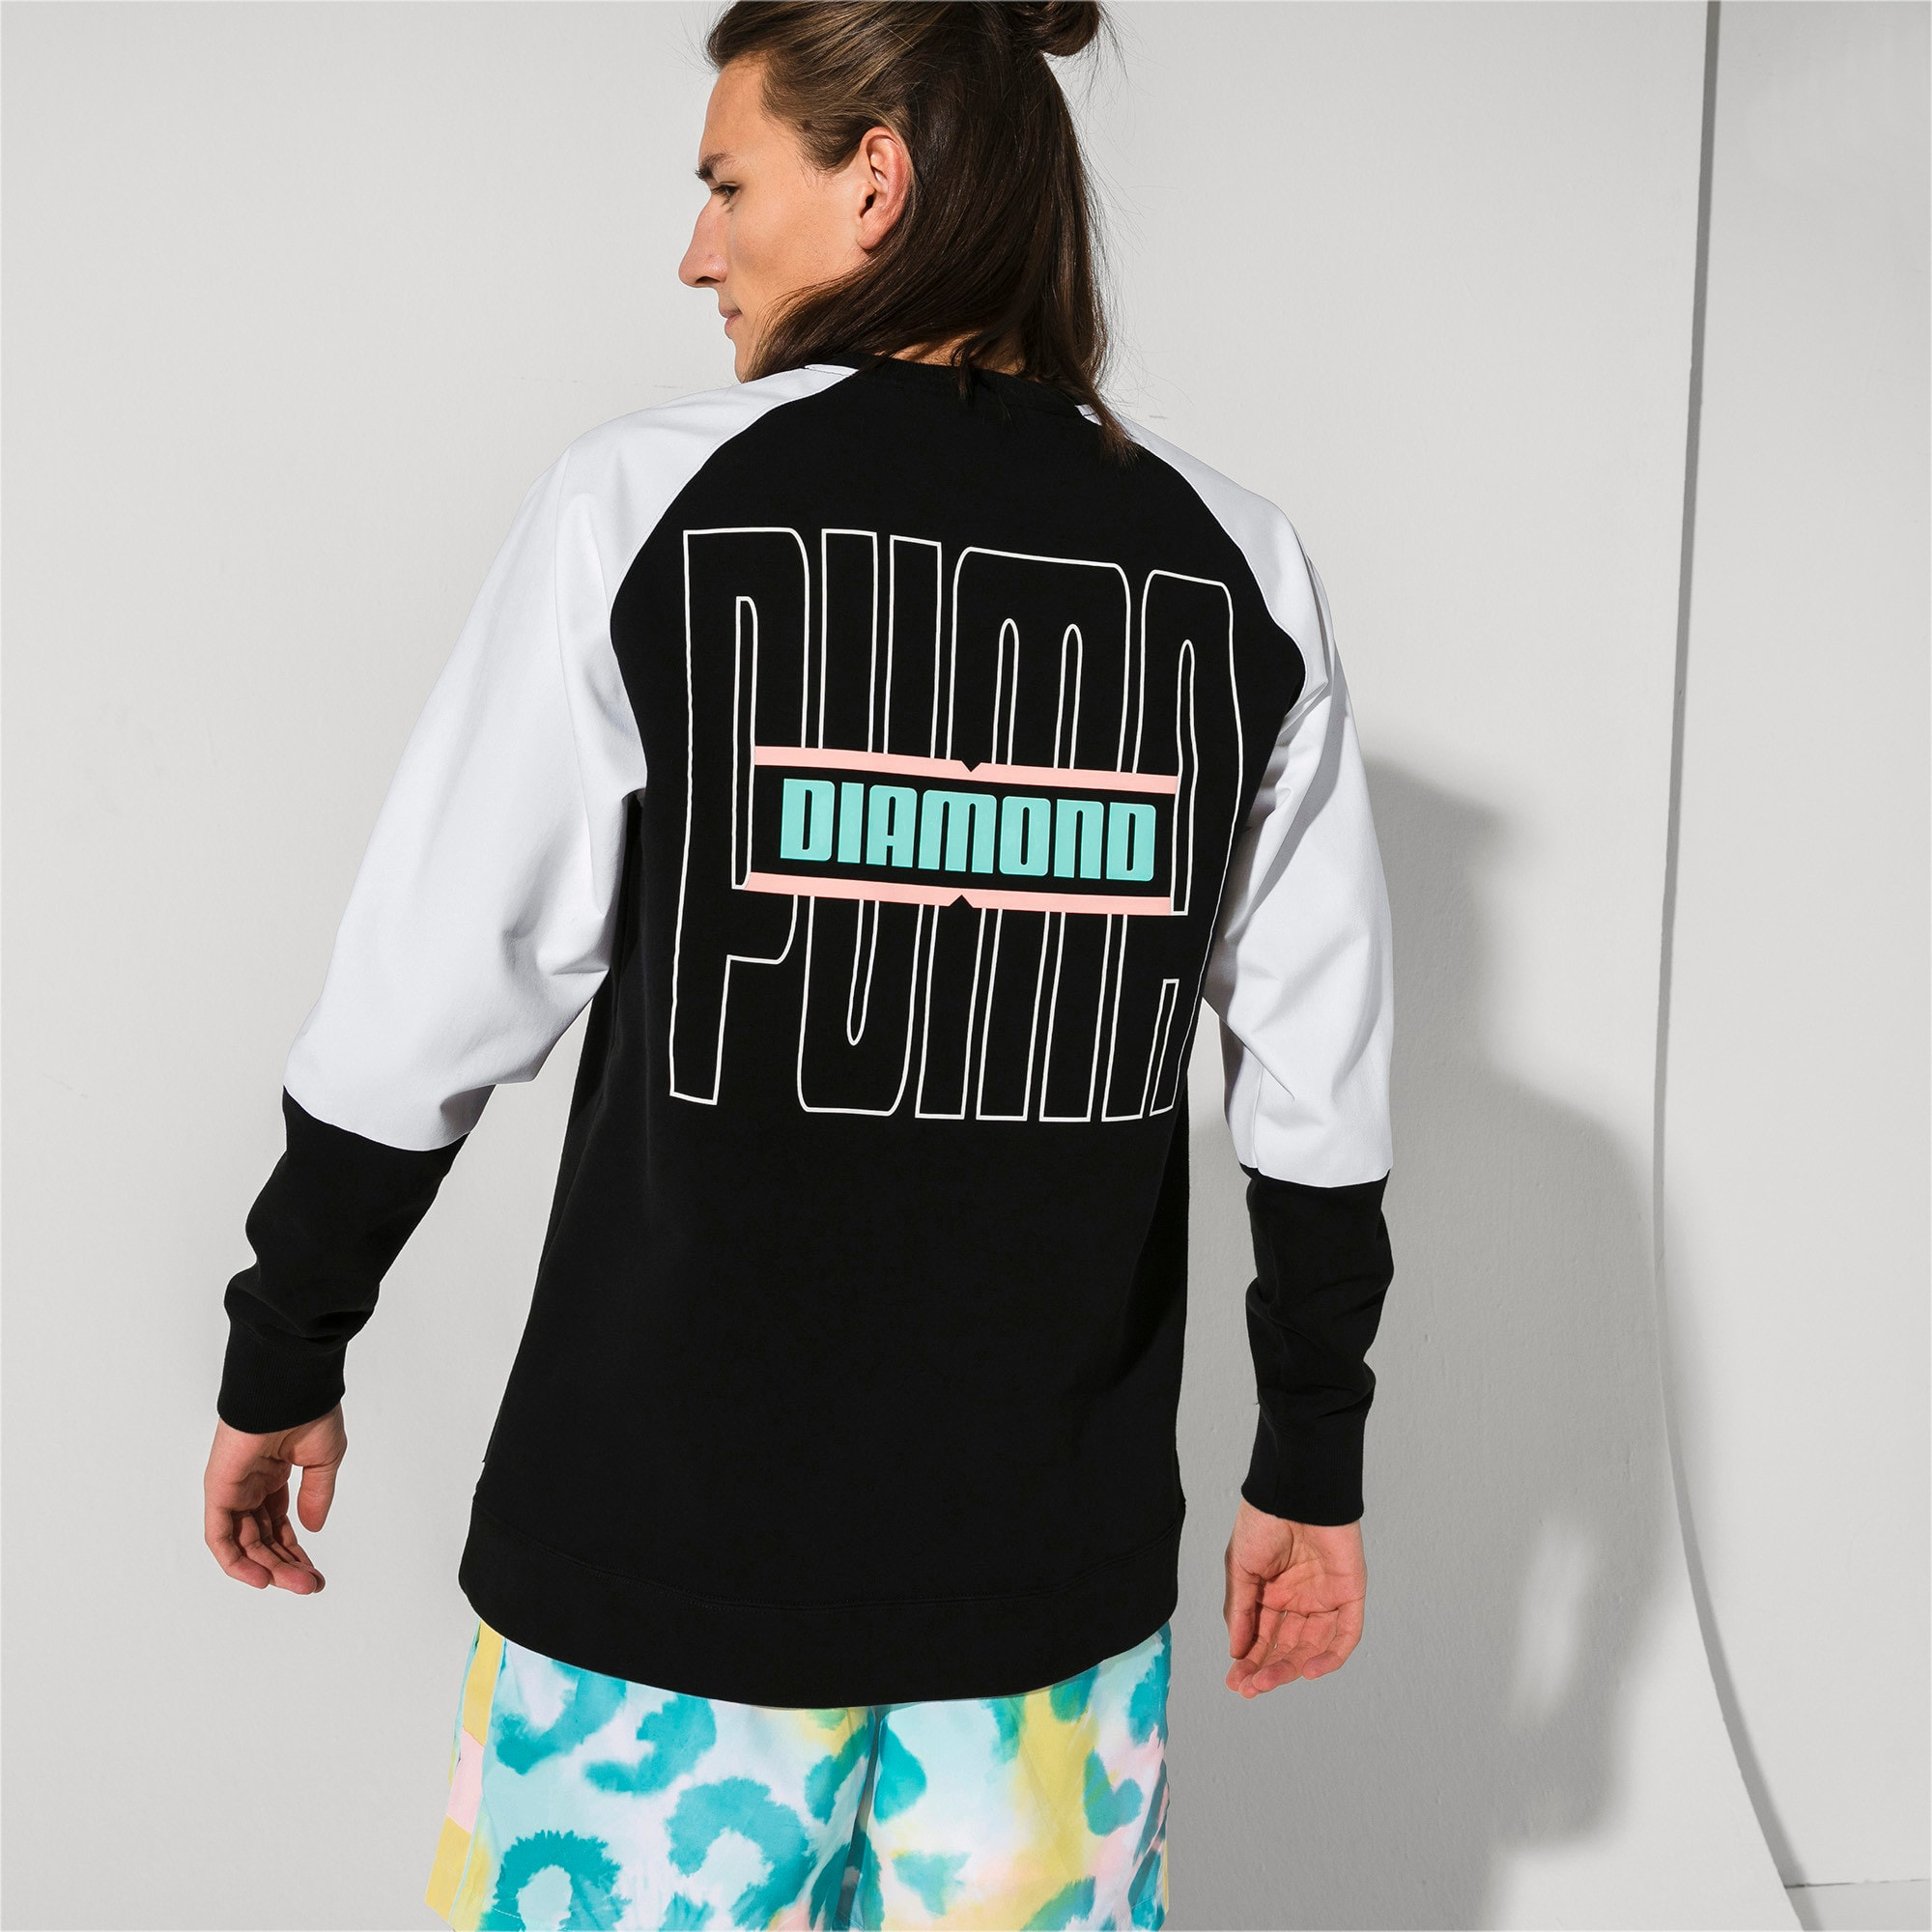 Thumbnail 2 of PUMA x DIAMOND Crew Neck Pullover, Puma Black, medium